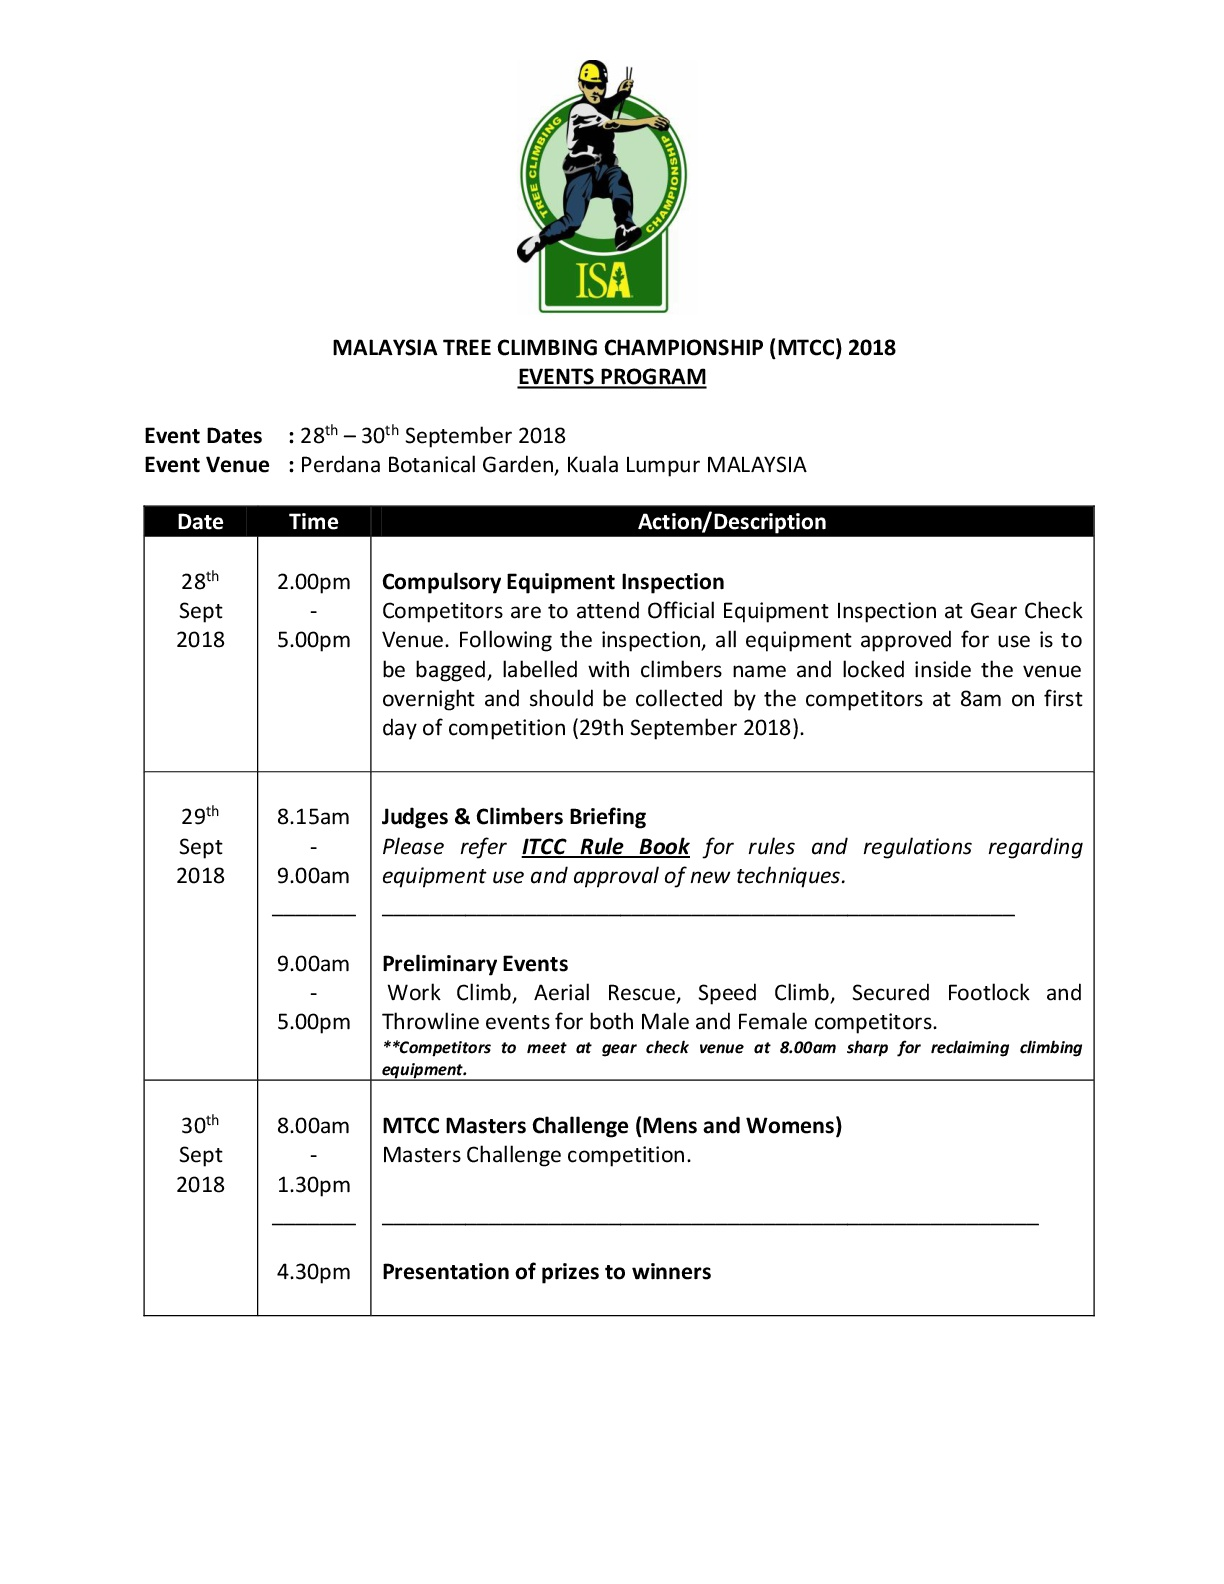 MTCC2018-COMPETITOR-INFORMATION-KIT-001